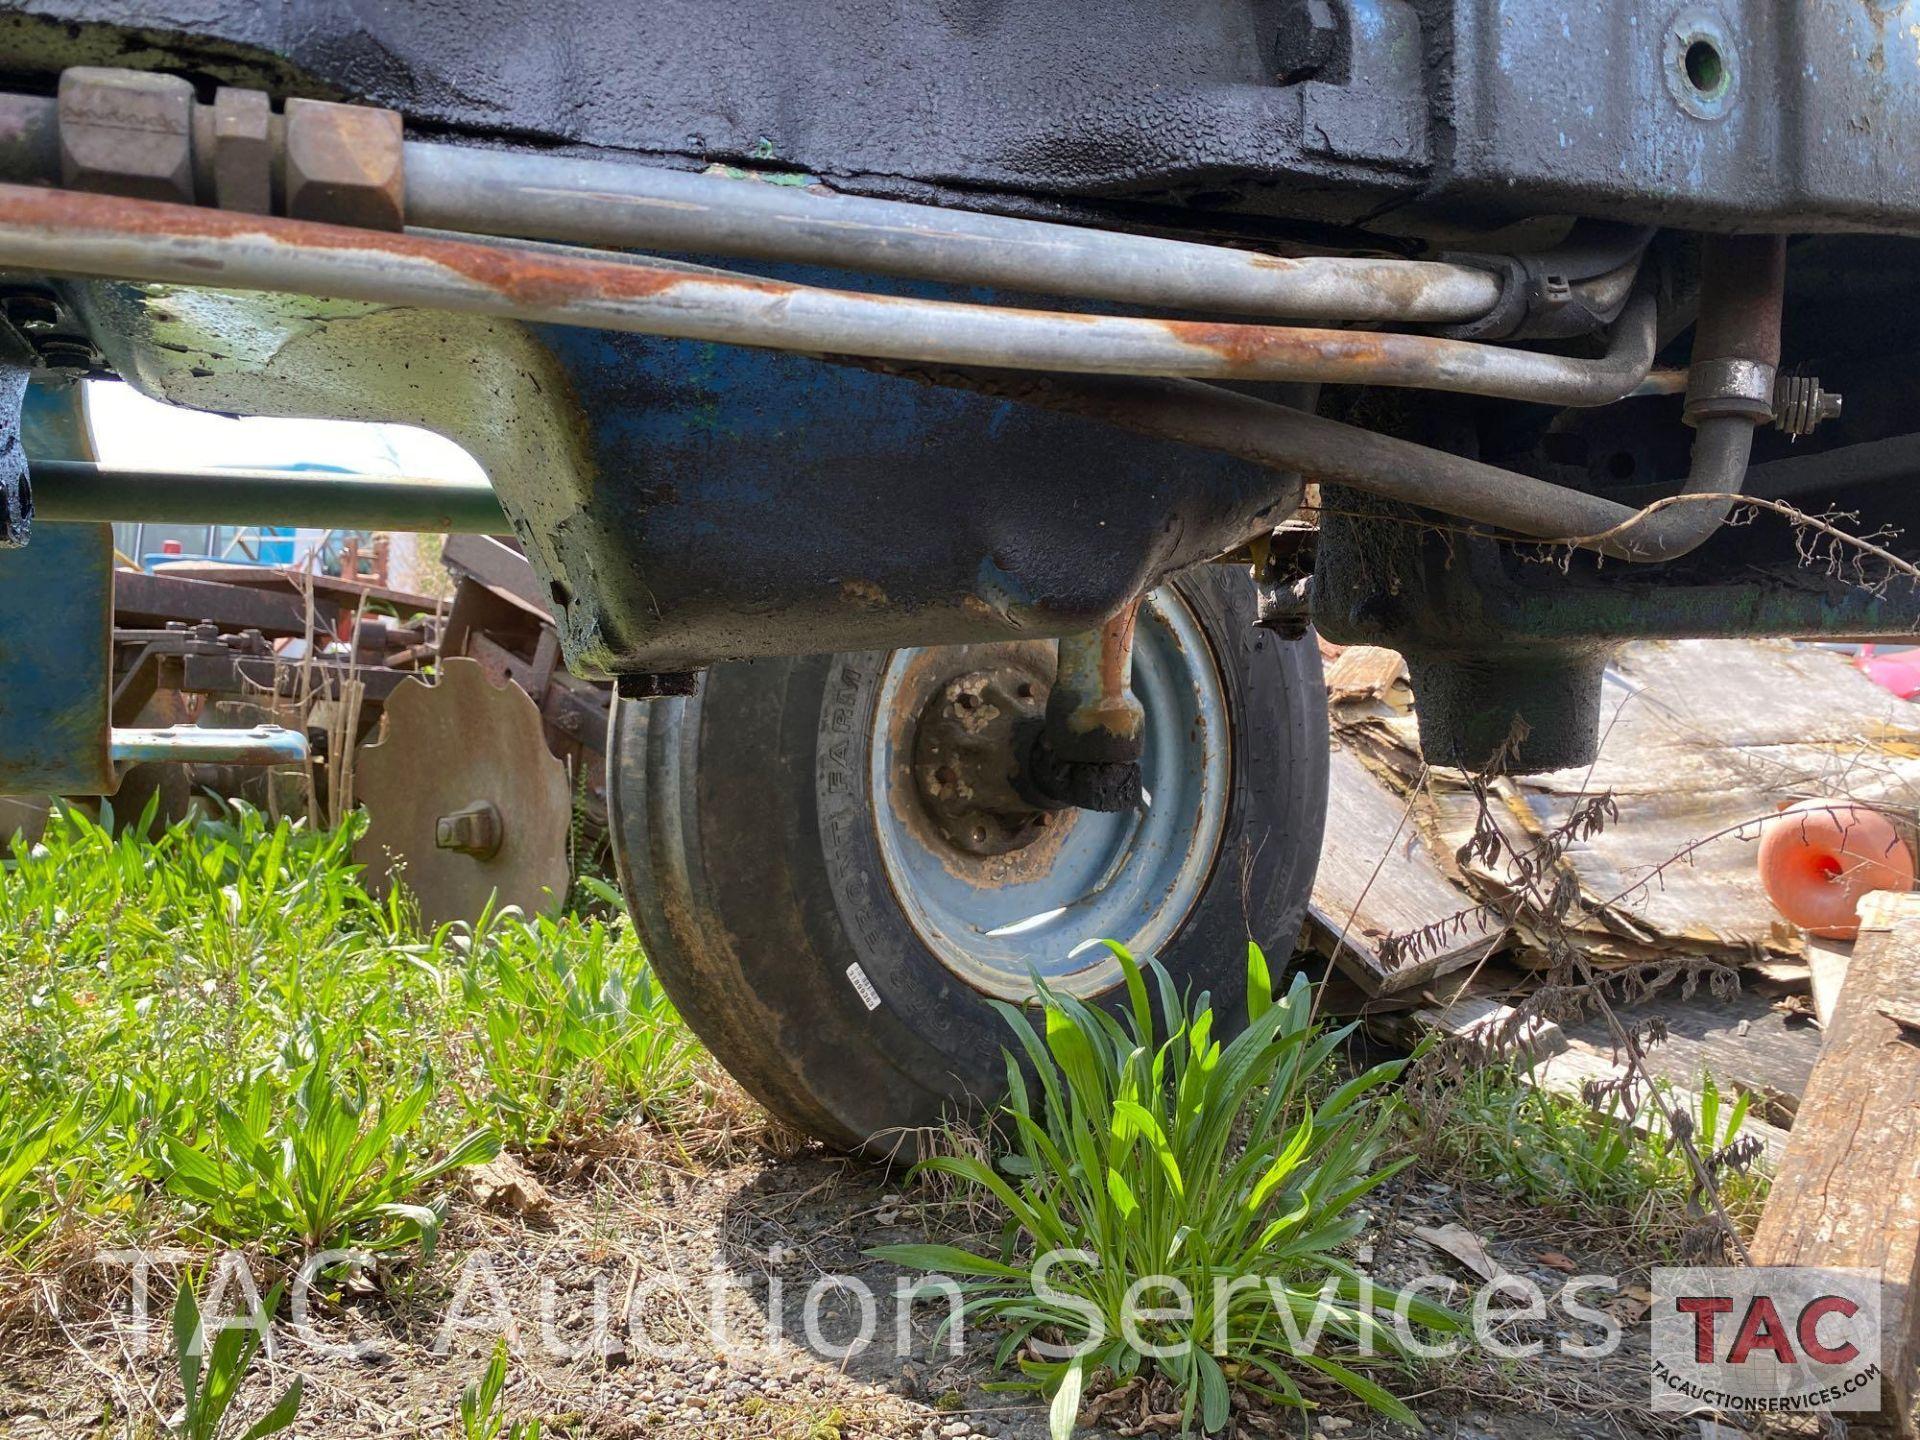 John Deere 2150 Farm Tractor - Image 27 of 34